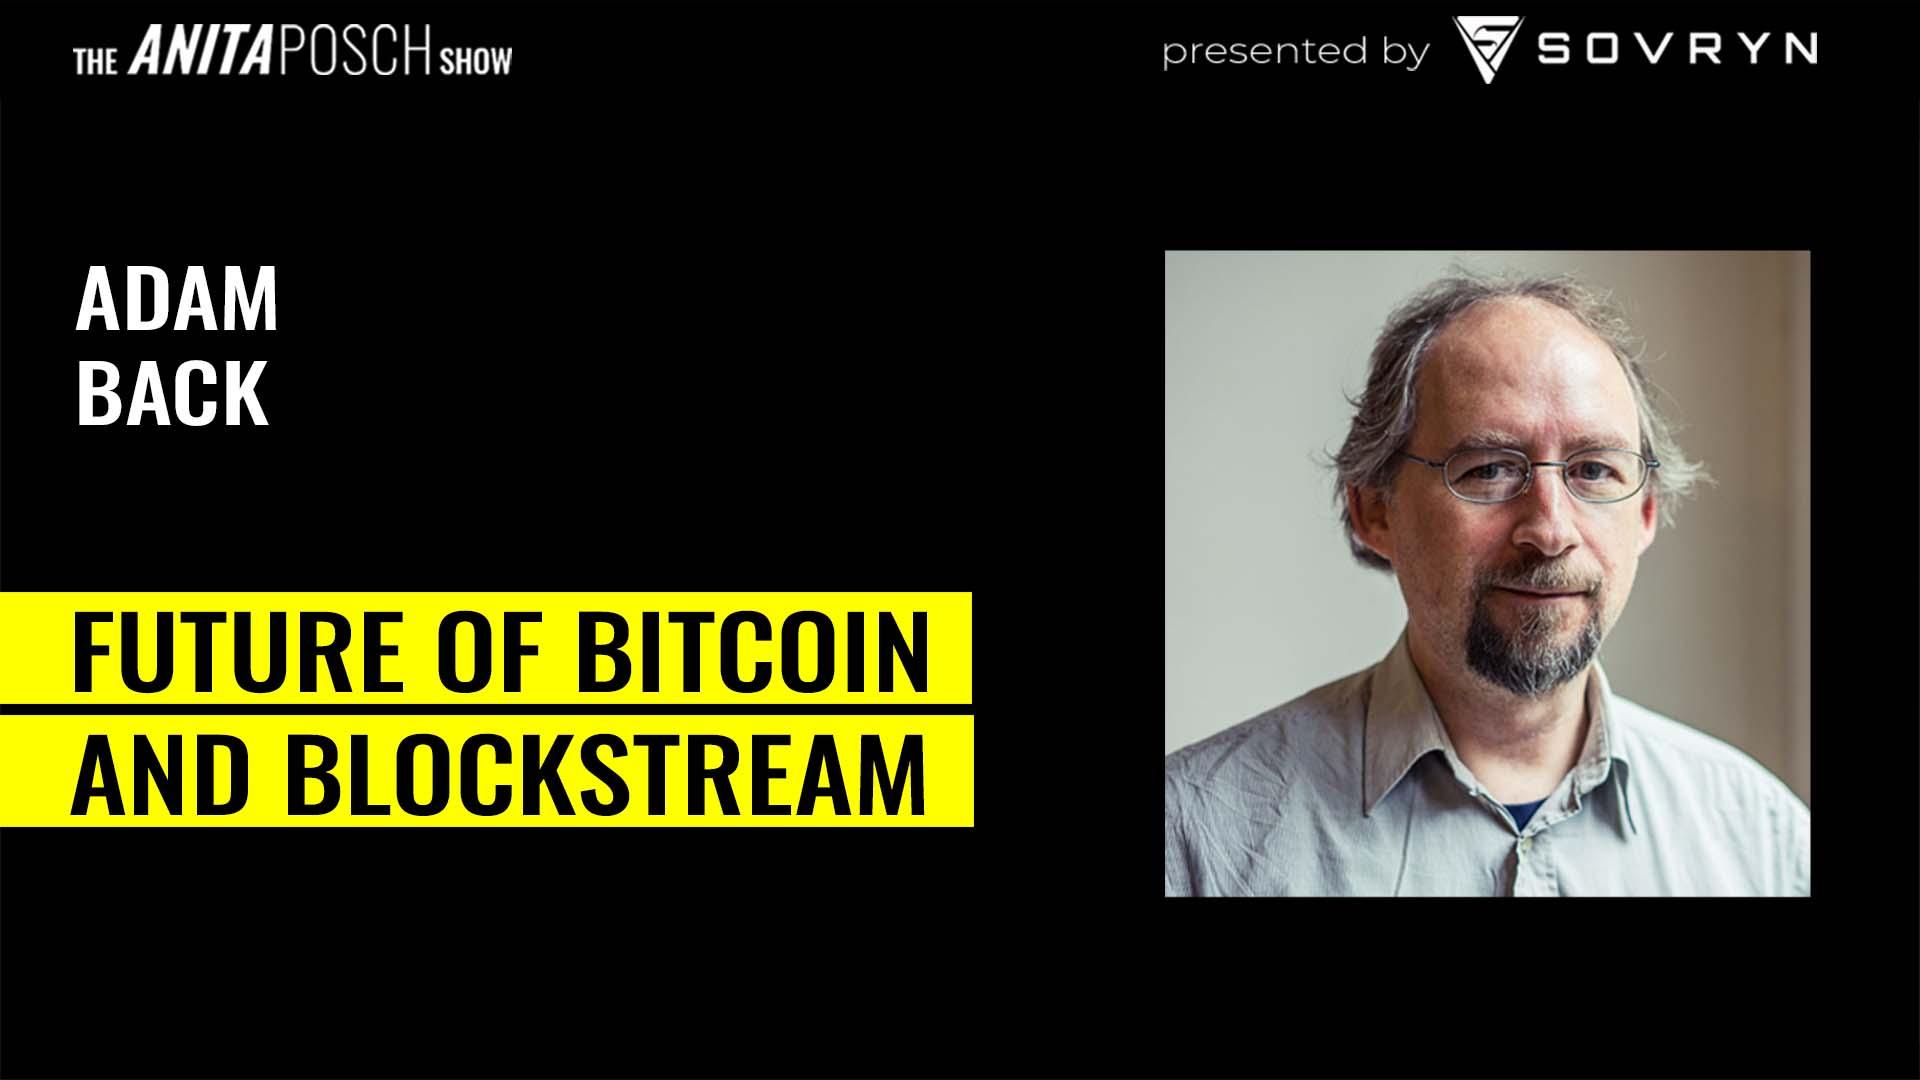 Adam Back, Blockstream Interview